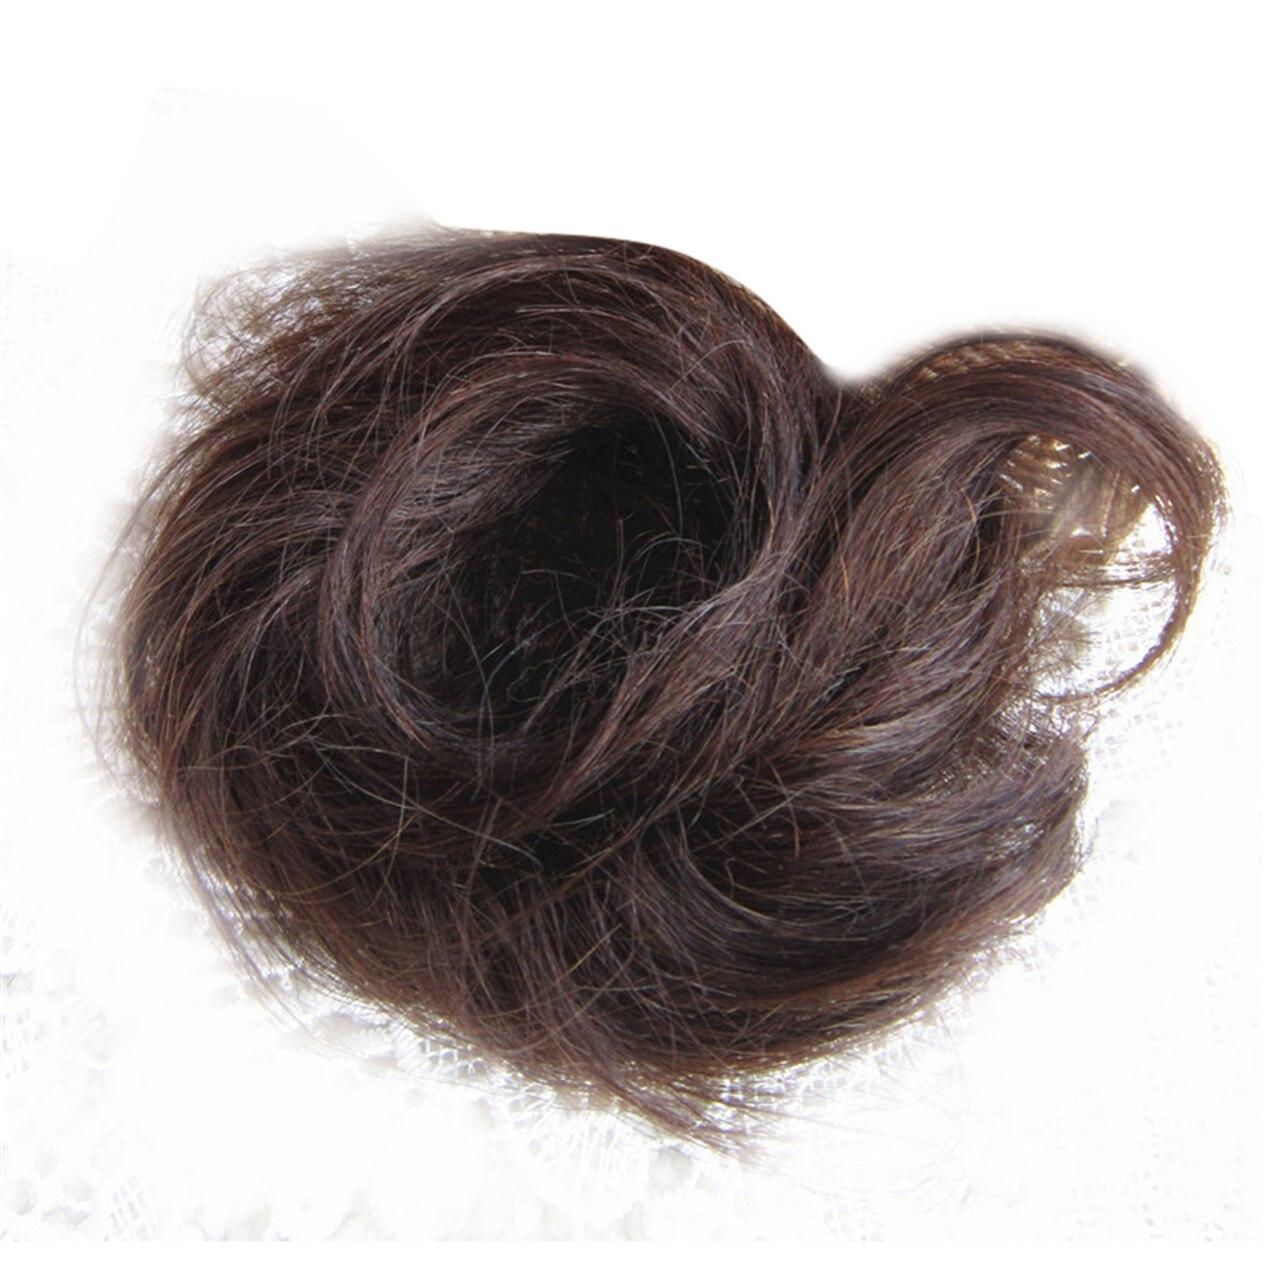 The Original Man Bun Instant Clip On Bun 100% Human Hair Extension 7